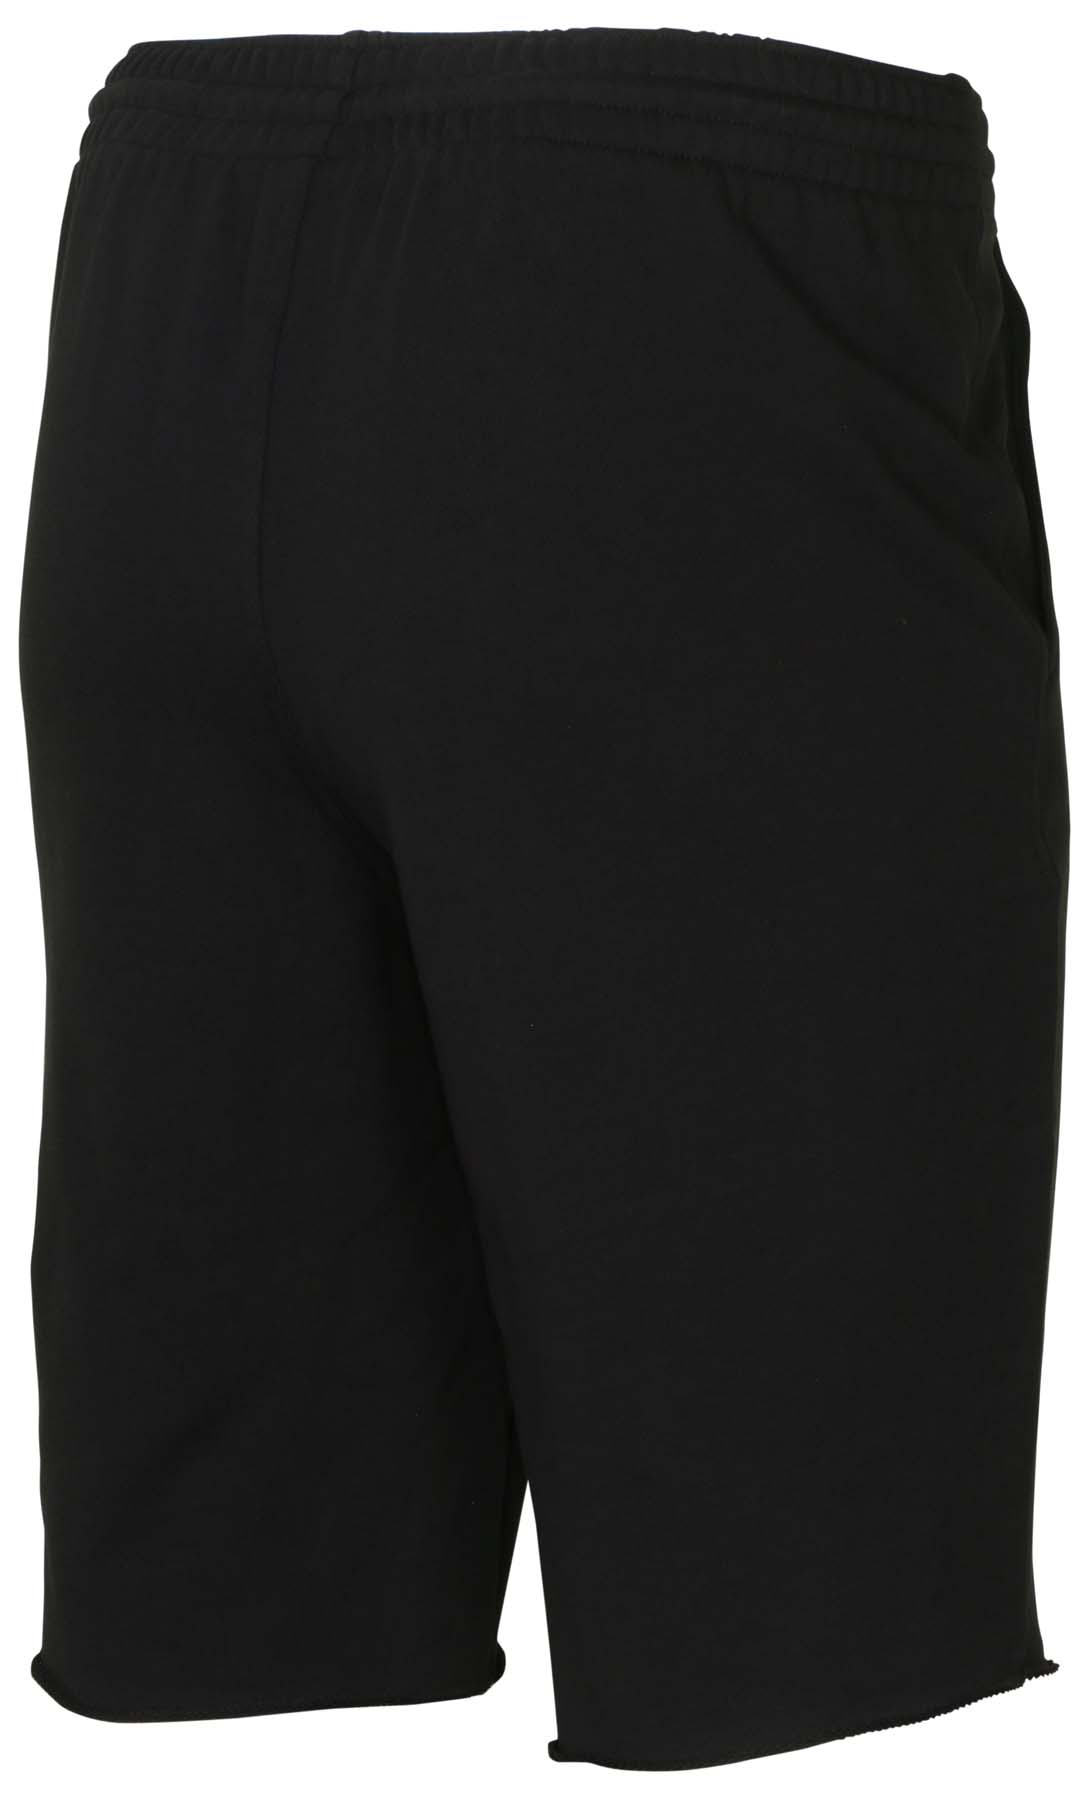 Jordan Men's Nike Retro 11 Legacy Casual Shorts | eBay